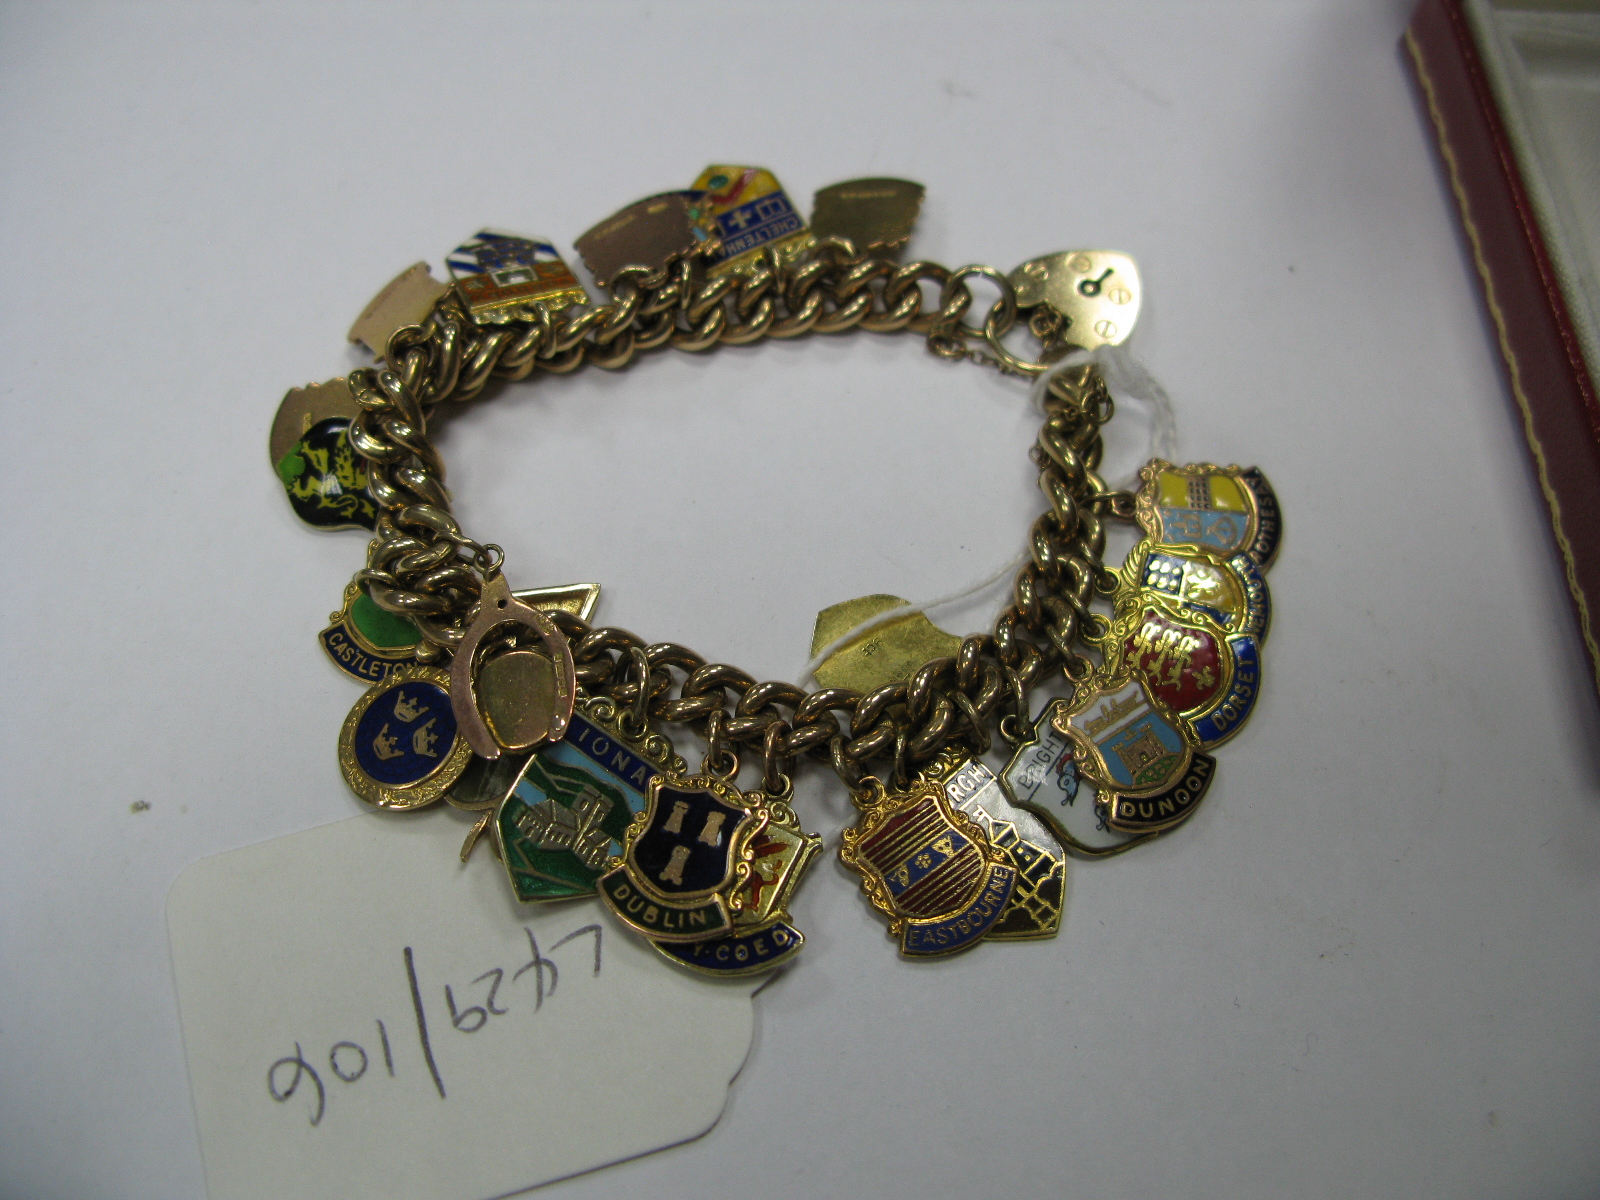 Lot 1387 - A 9ct Gold Curb Link Charm Bracelet, to 9ct gold heart shape padlock clasp, suspending numerous